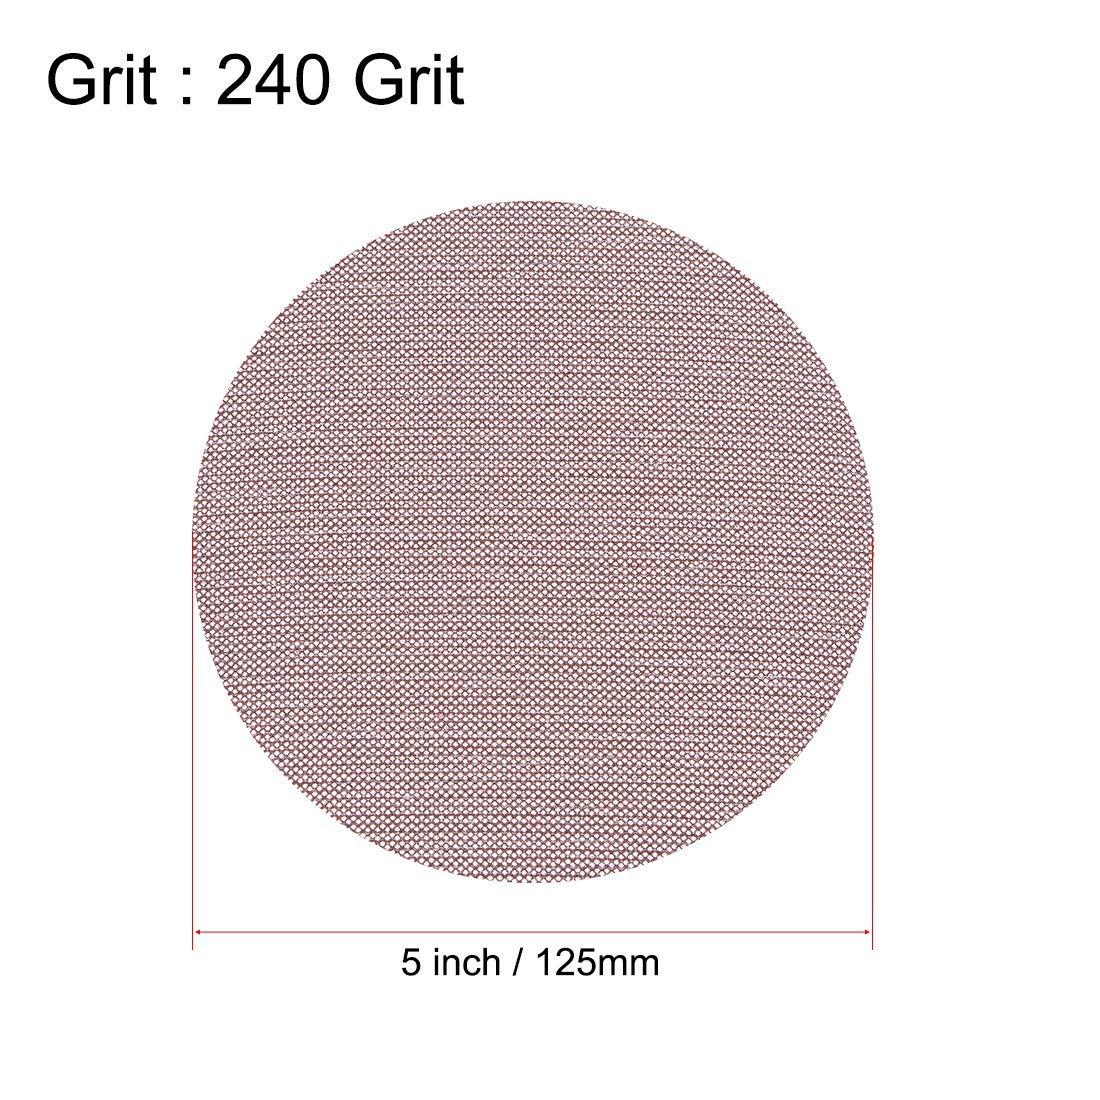 Mesh Sanding Discs 5 Inch 240 Grit Hook and Loop Grip Disc 3 pieces